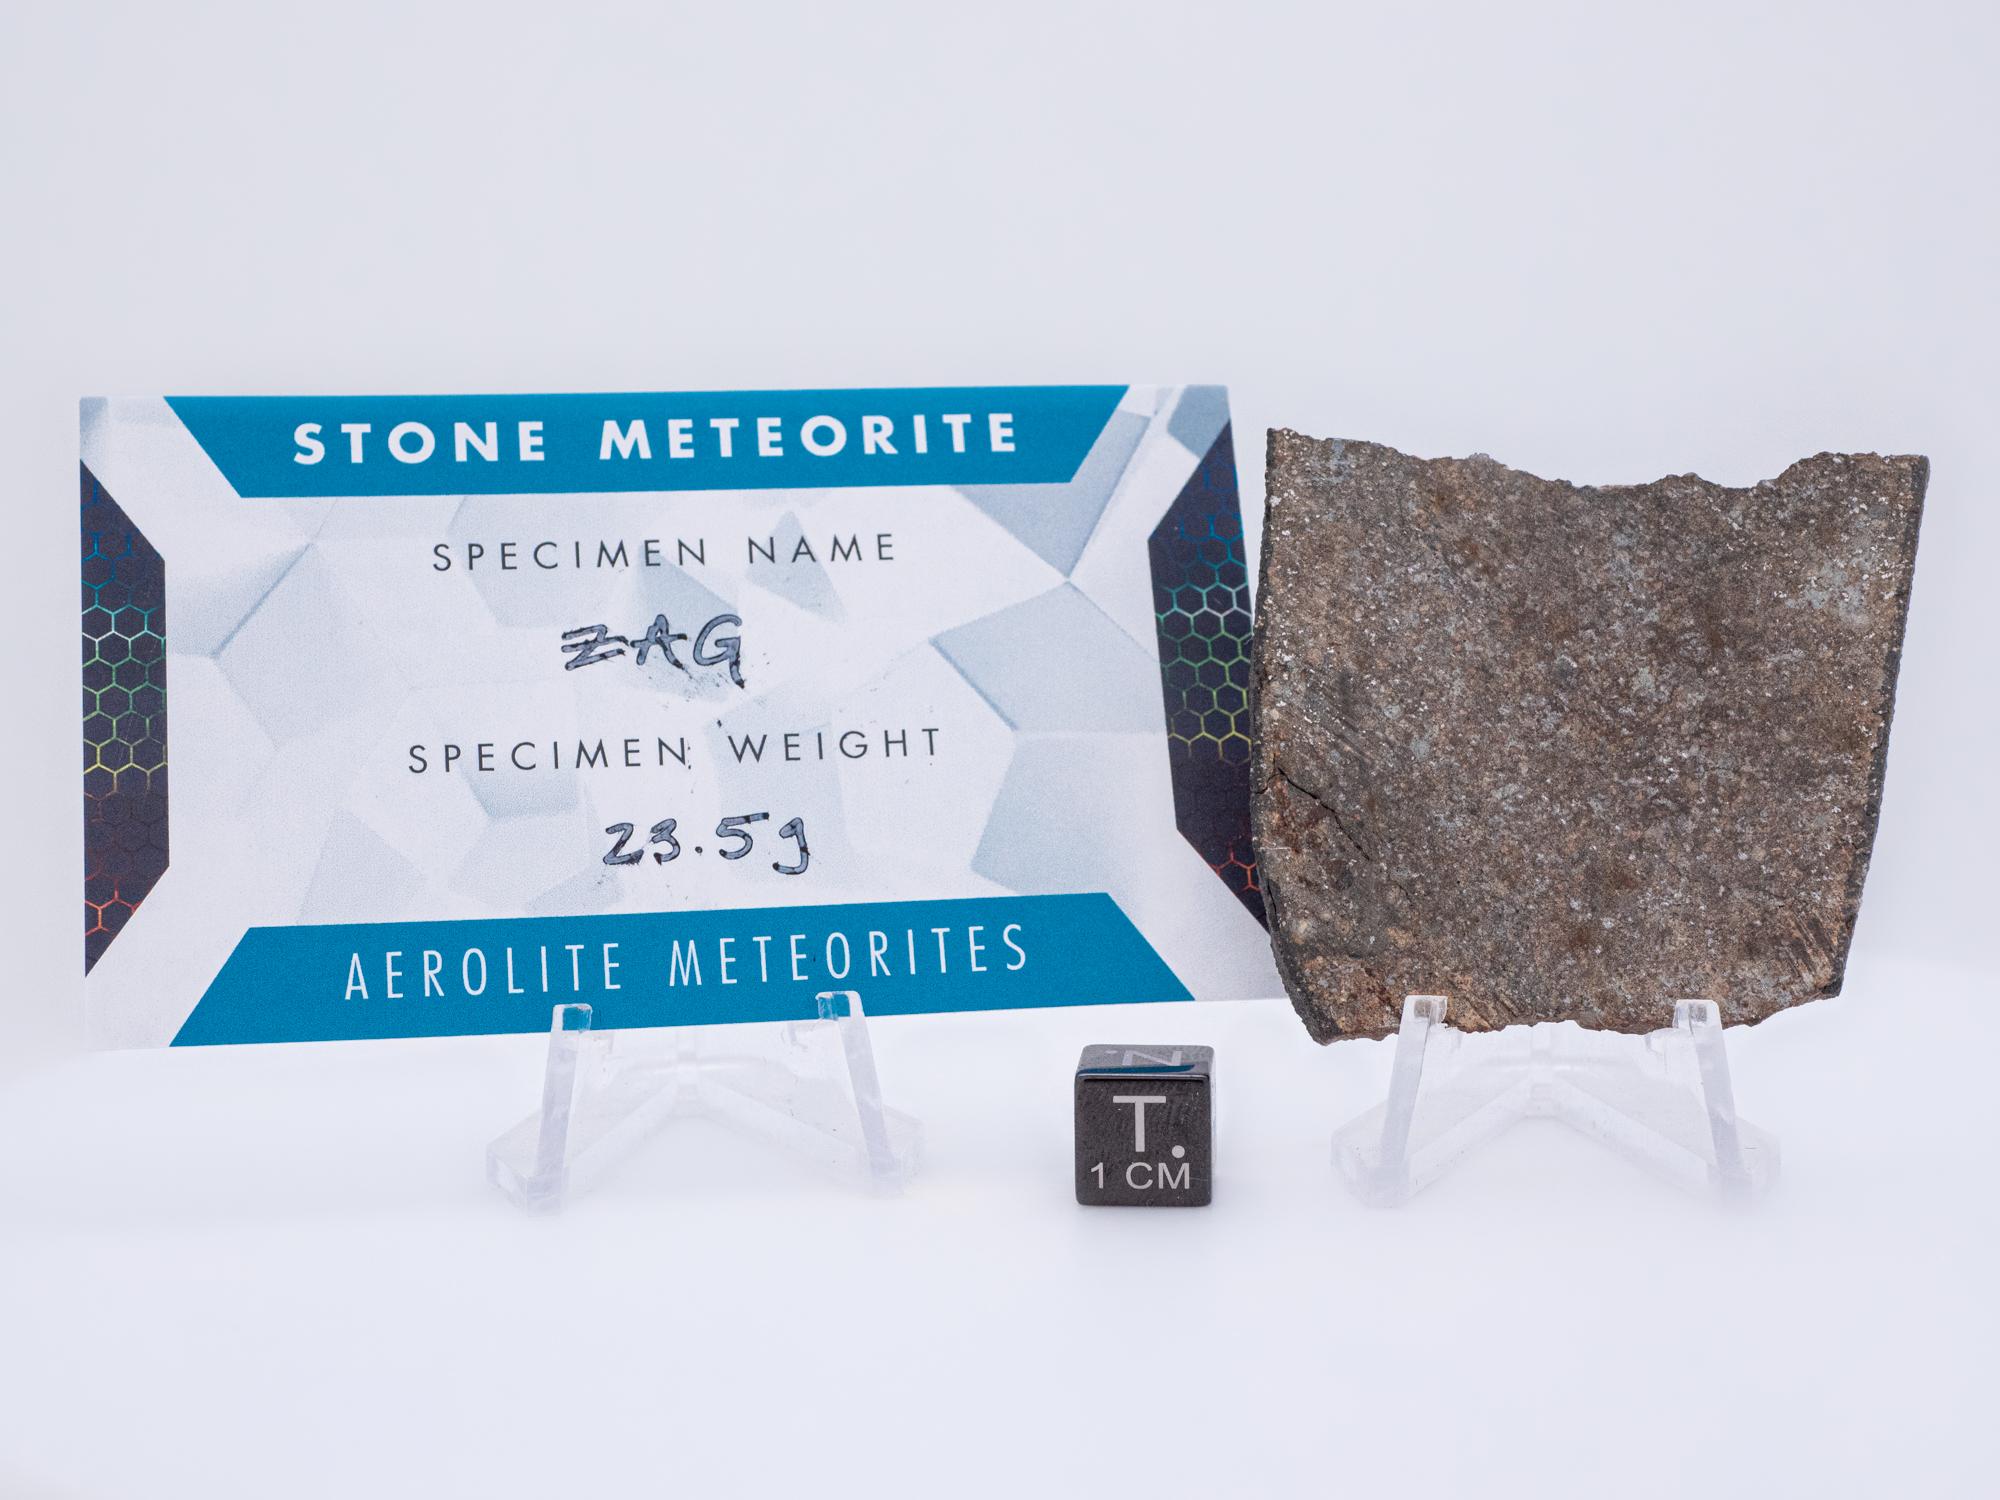 zag meteorite 23g